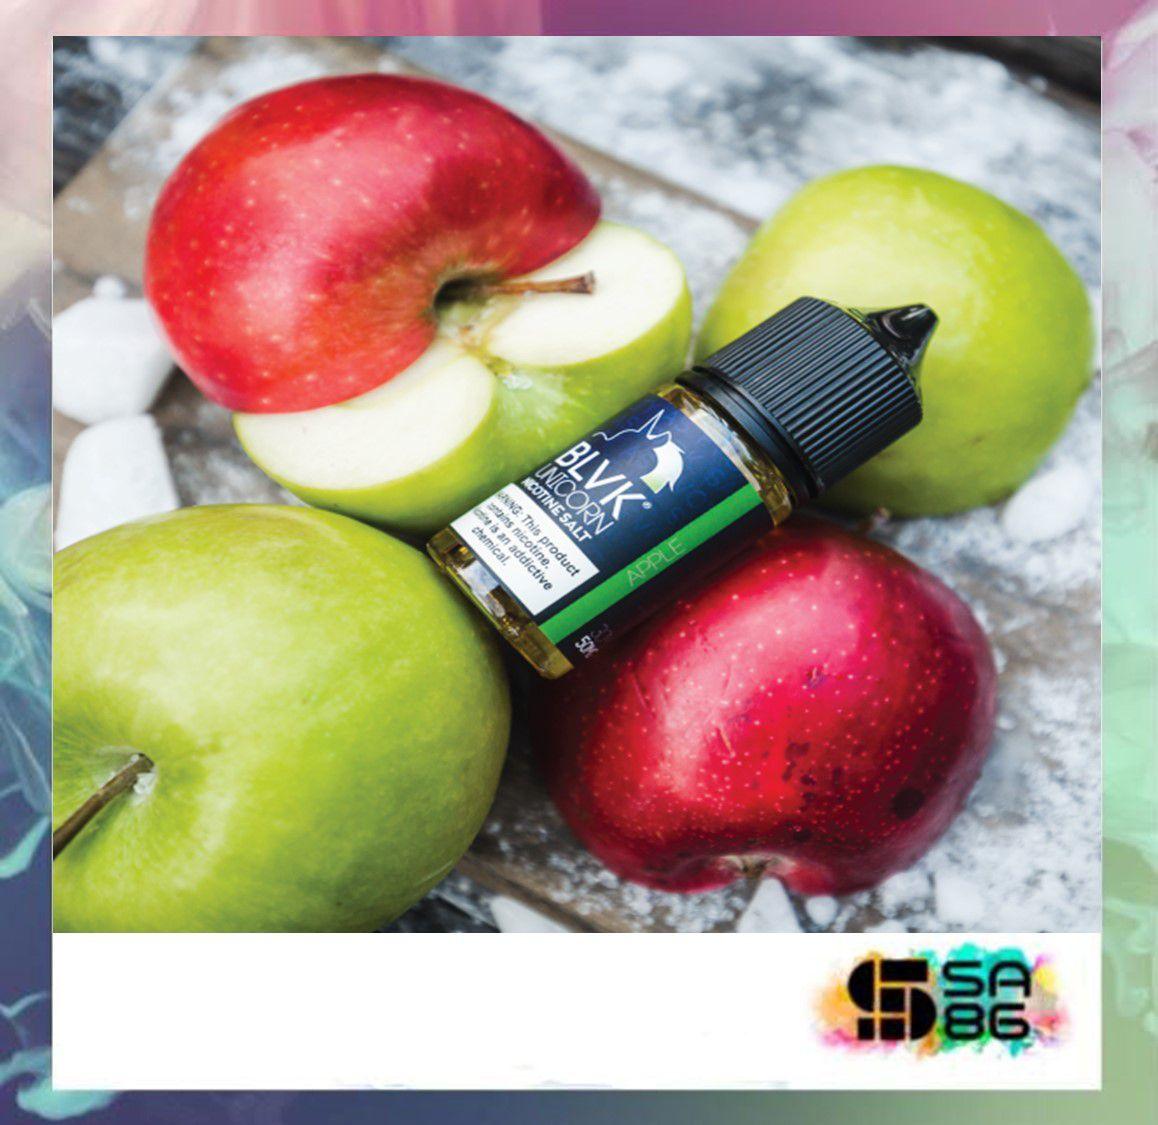 BLVK UNICORN NIC SALT 30 ML - Apple